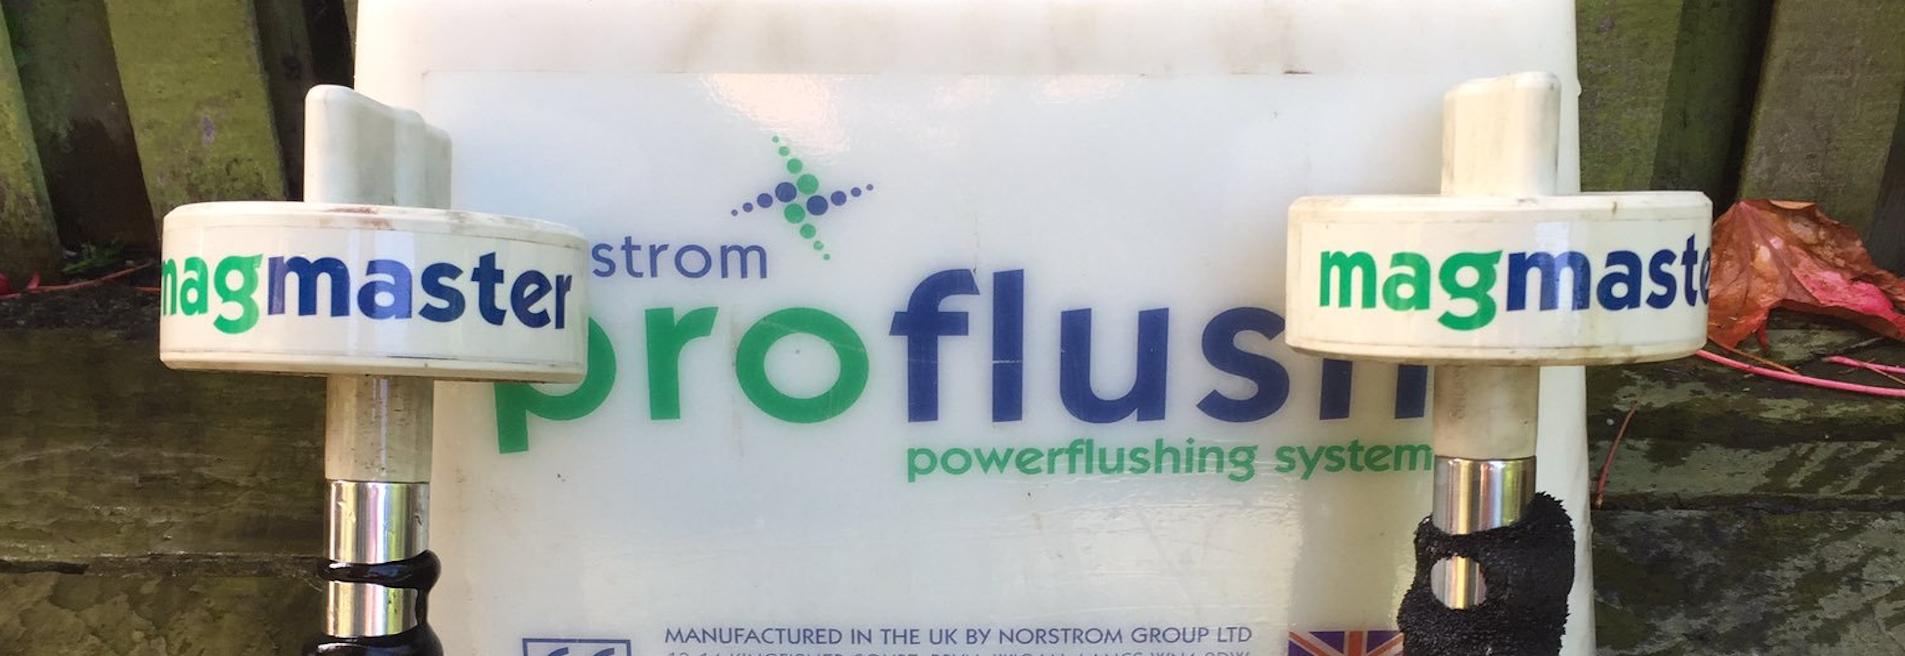 Power Flush Merseyside St Helens Warrington Widnes St Helens Merseyside